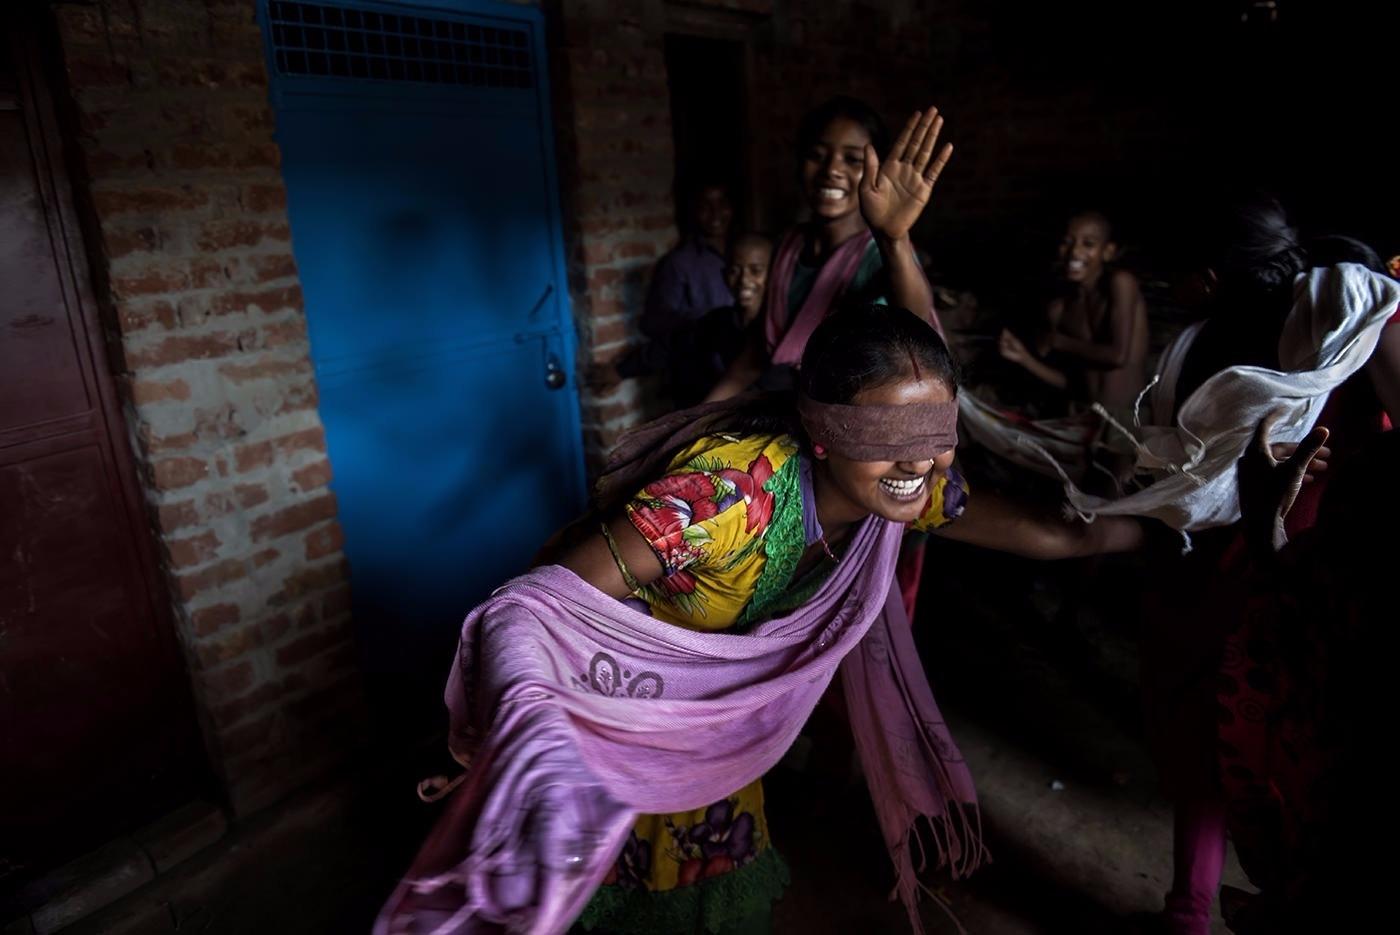 Child Brides Uttar Pradesh by Woman Photographer